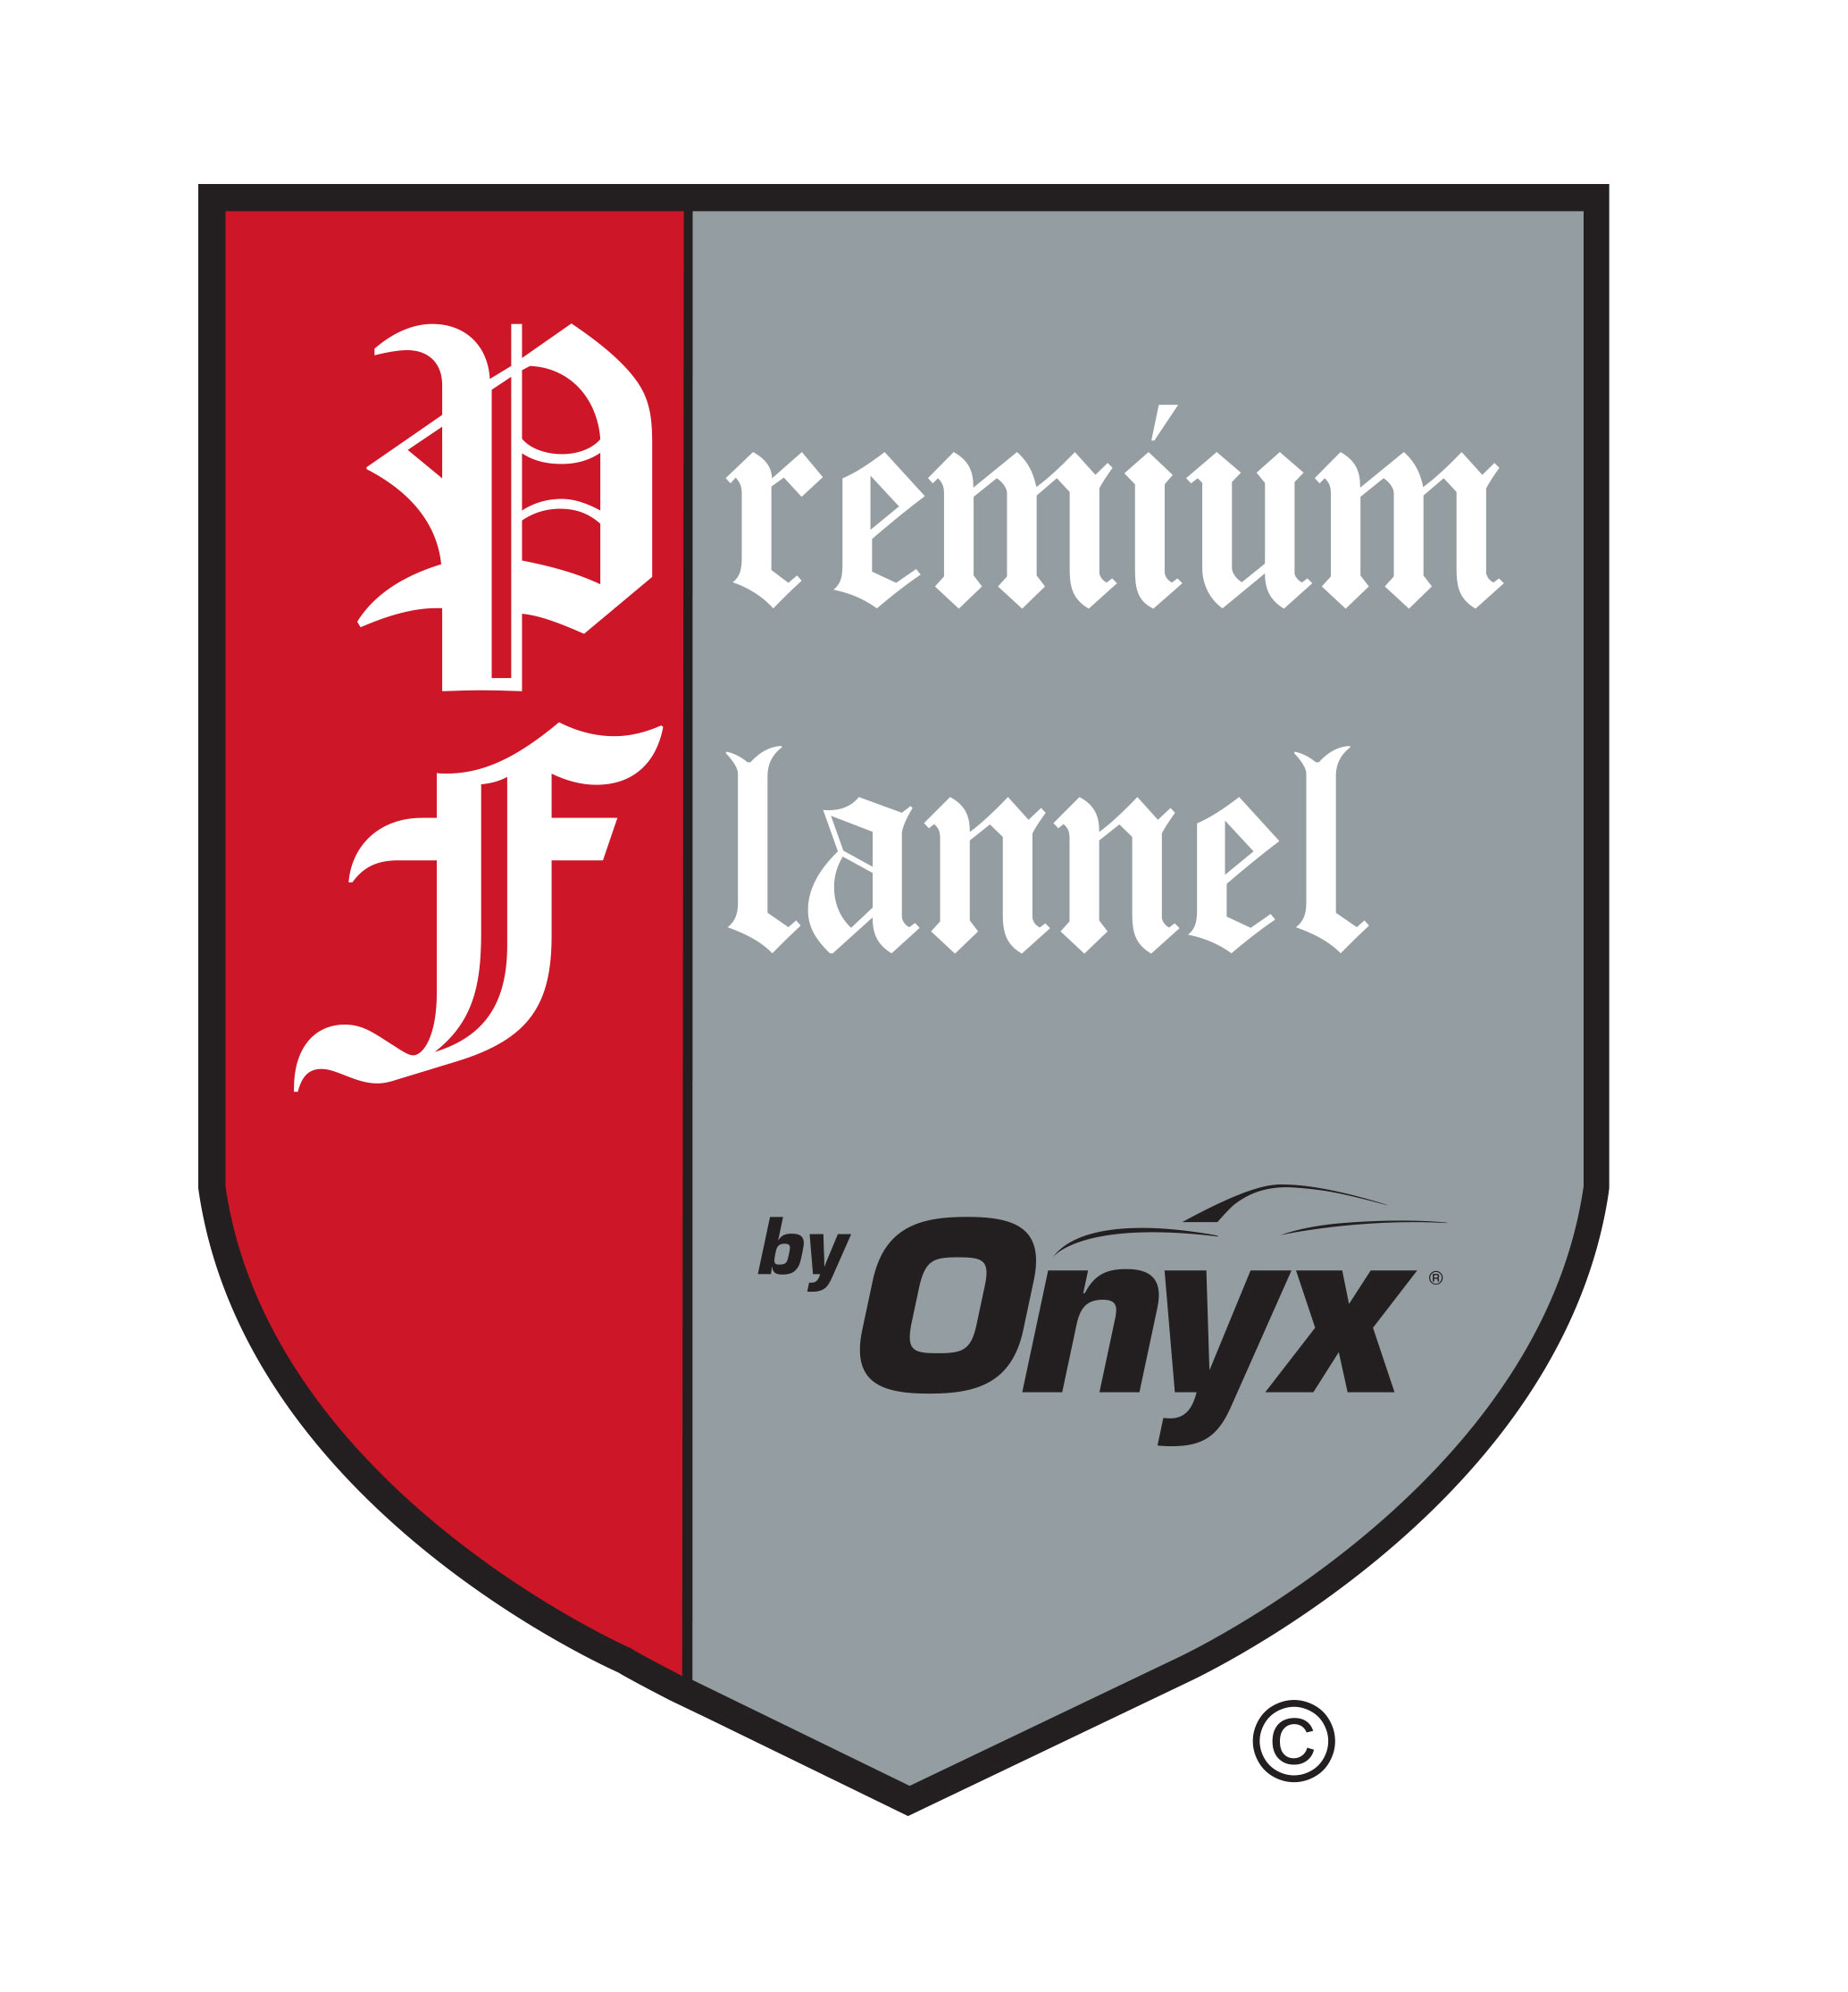 Premium Flannel by Onyx logo